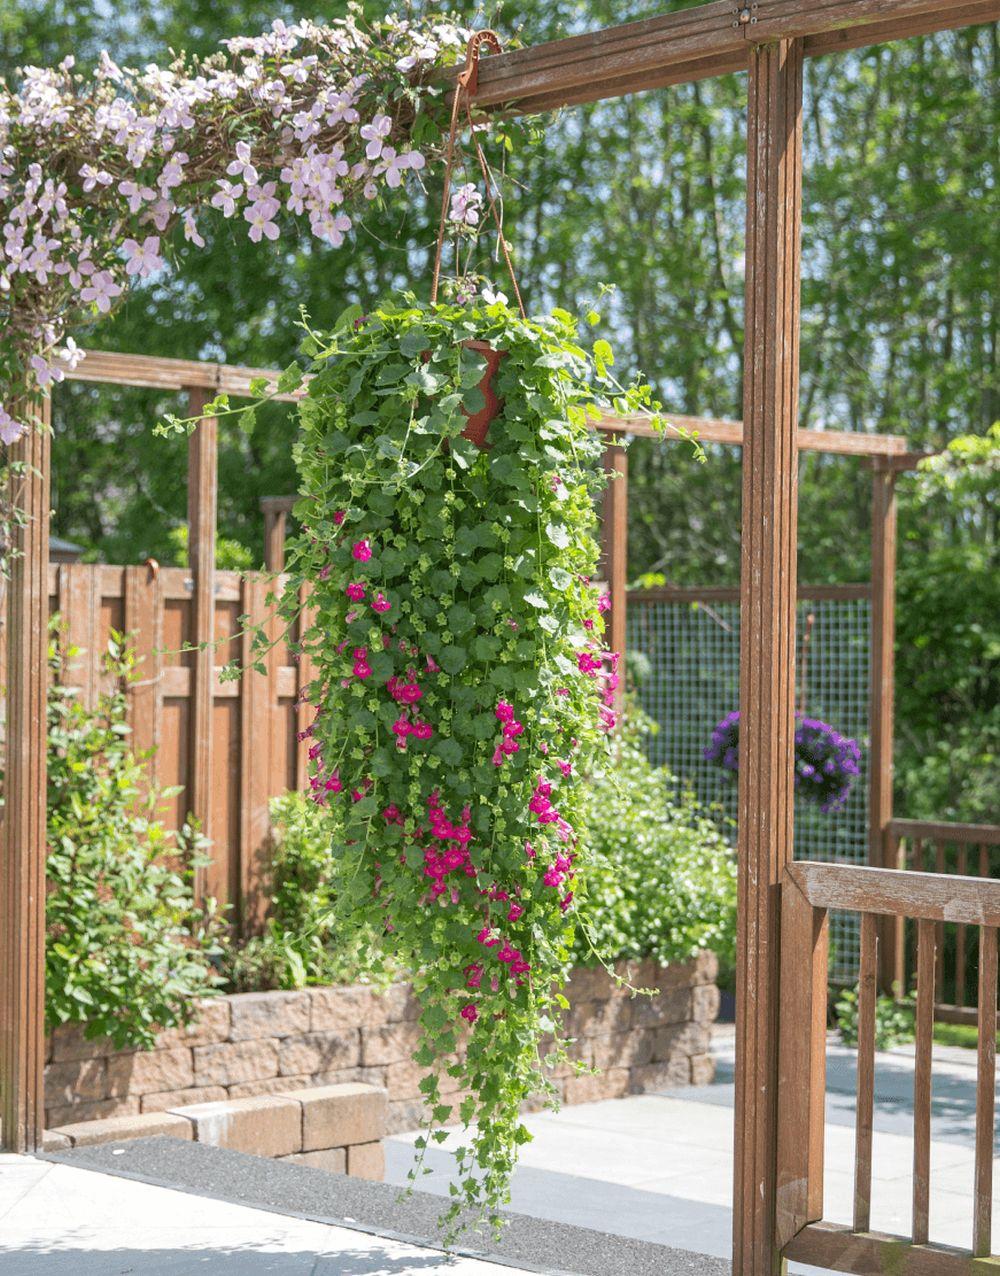 adelaparvu.com top 5 plante cataratoare, Text Carli Marian, In foto Lophospermum (1)